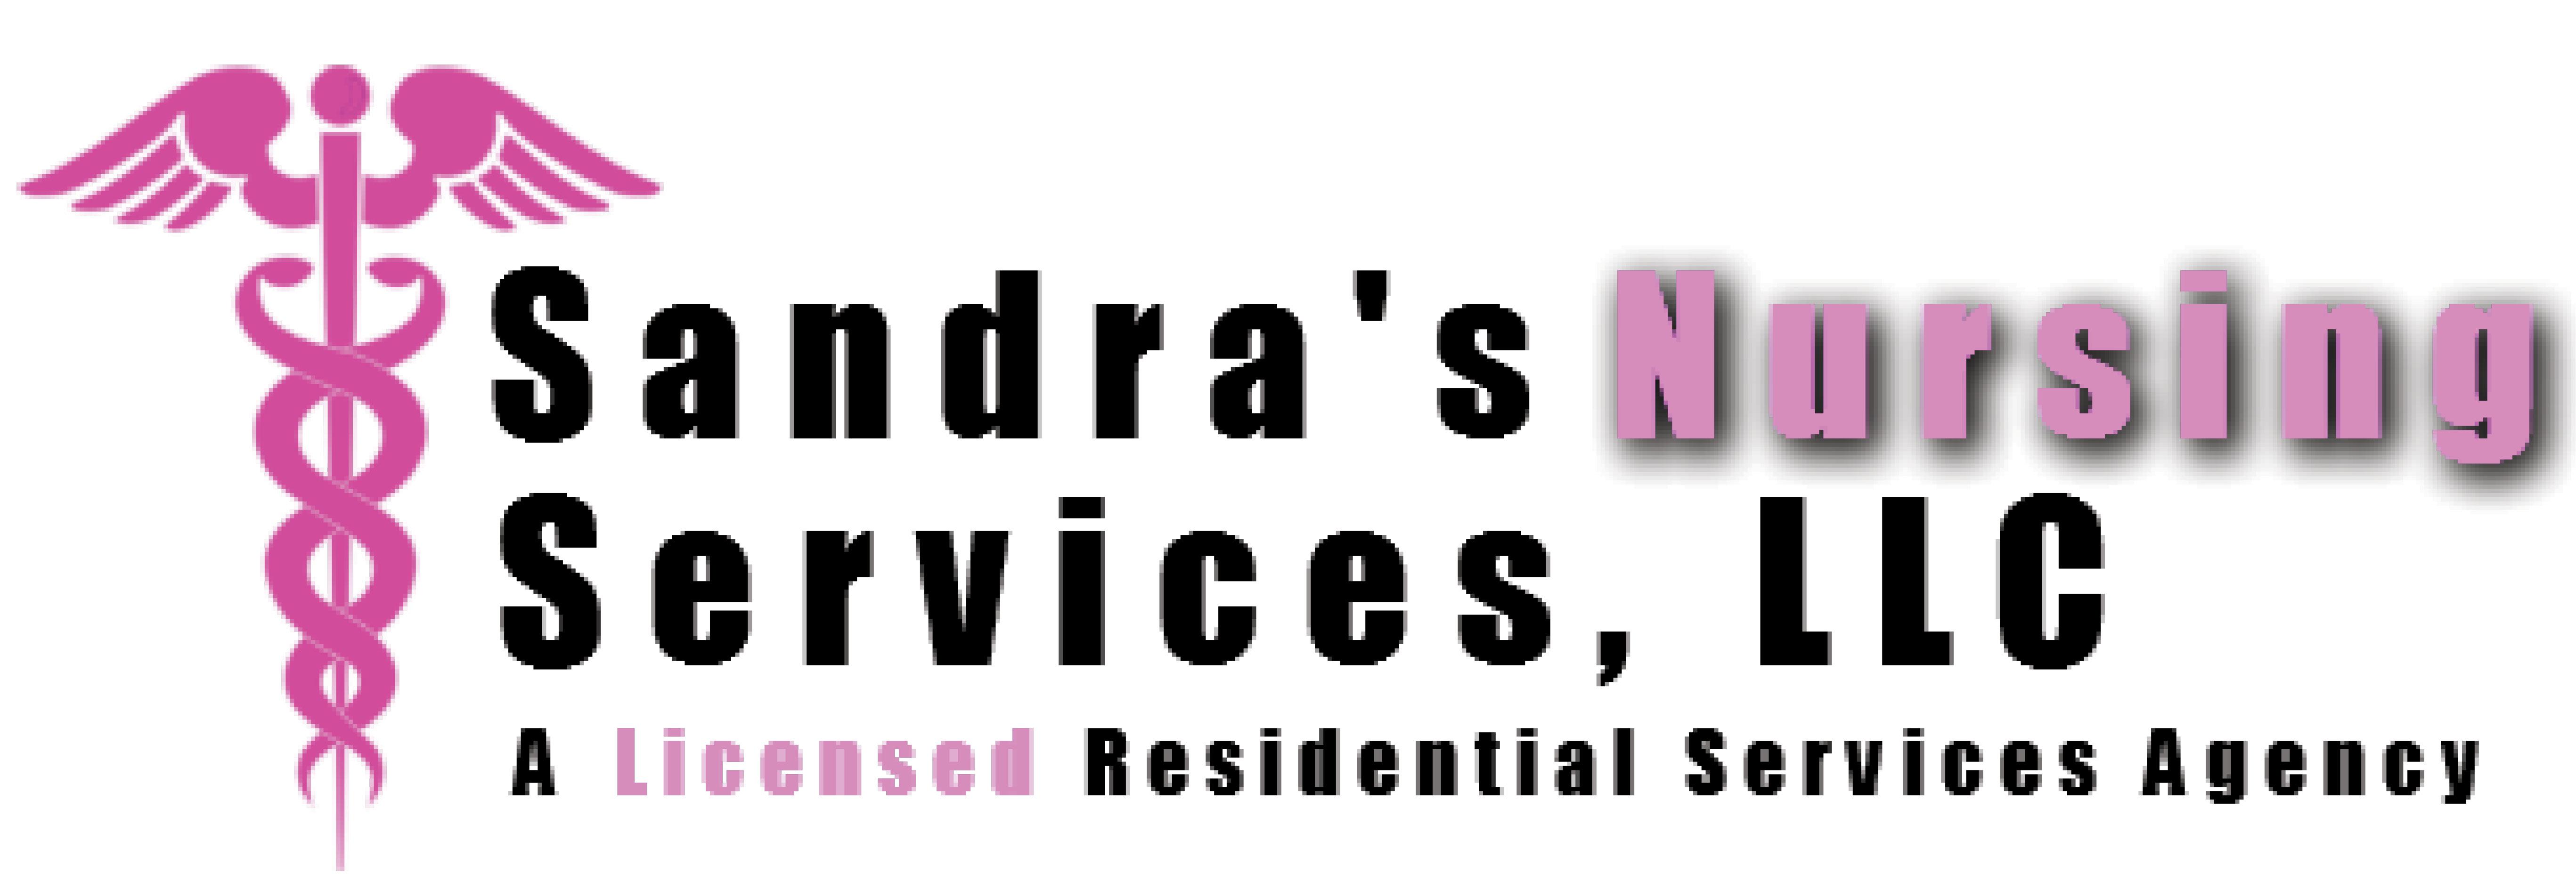 Sandra's Nursing Services